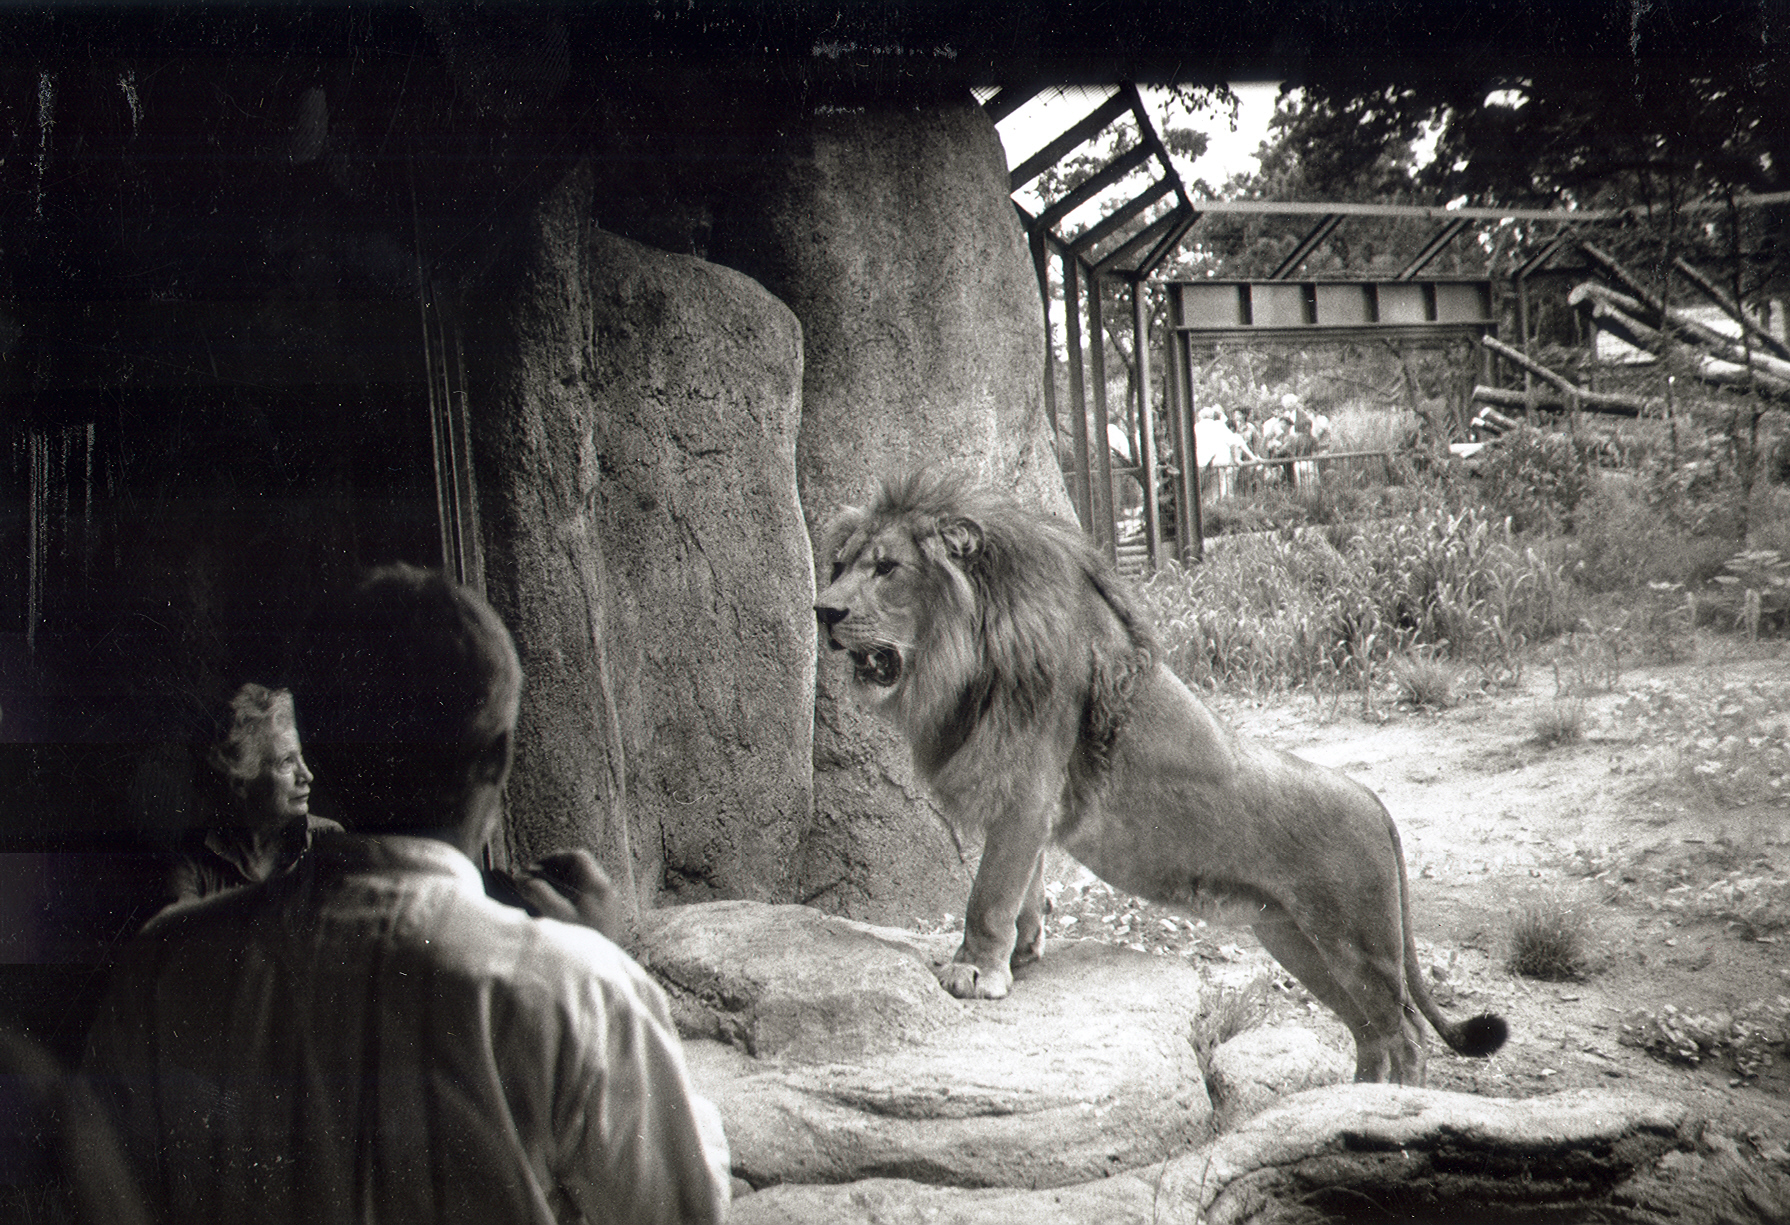 The original pride of lions featured a male, Samburu, and two females, Arusha and Manyara.